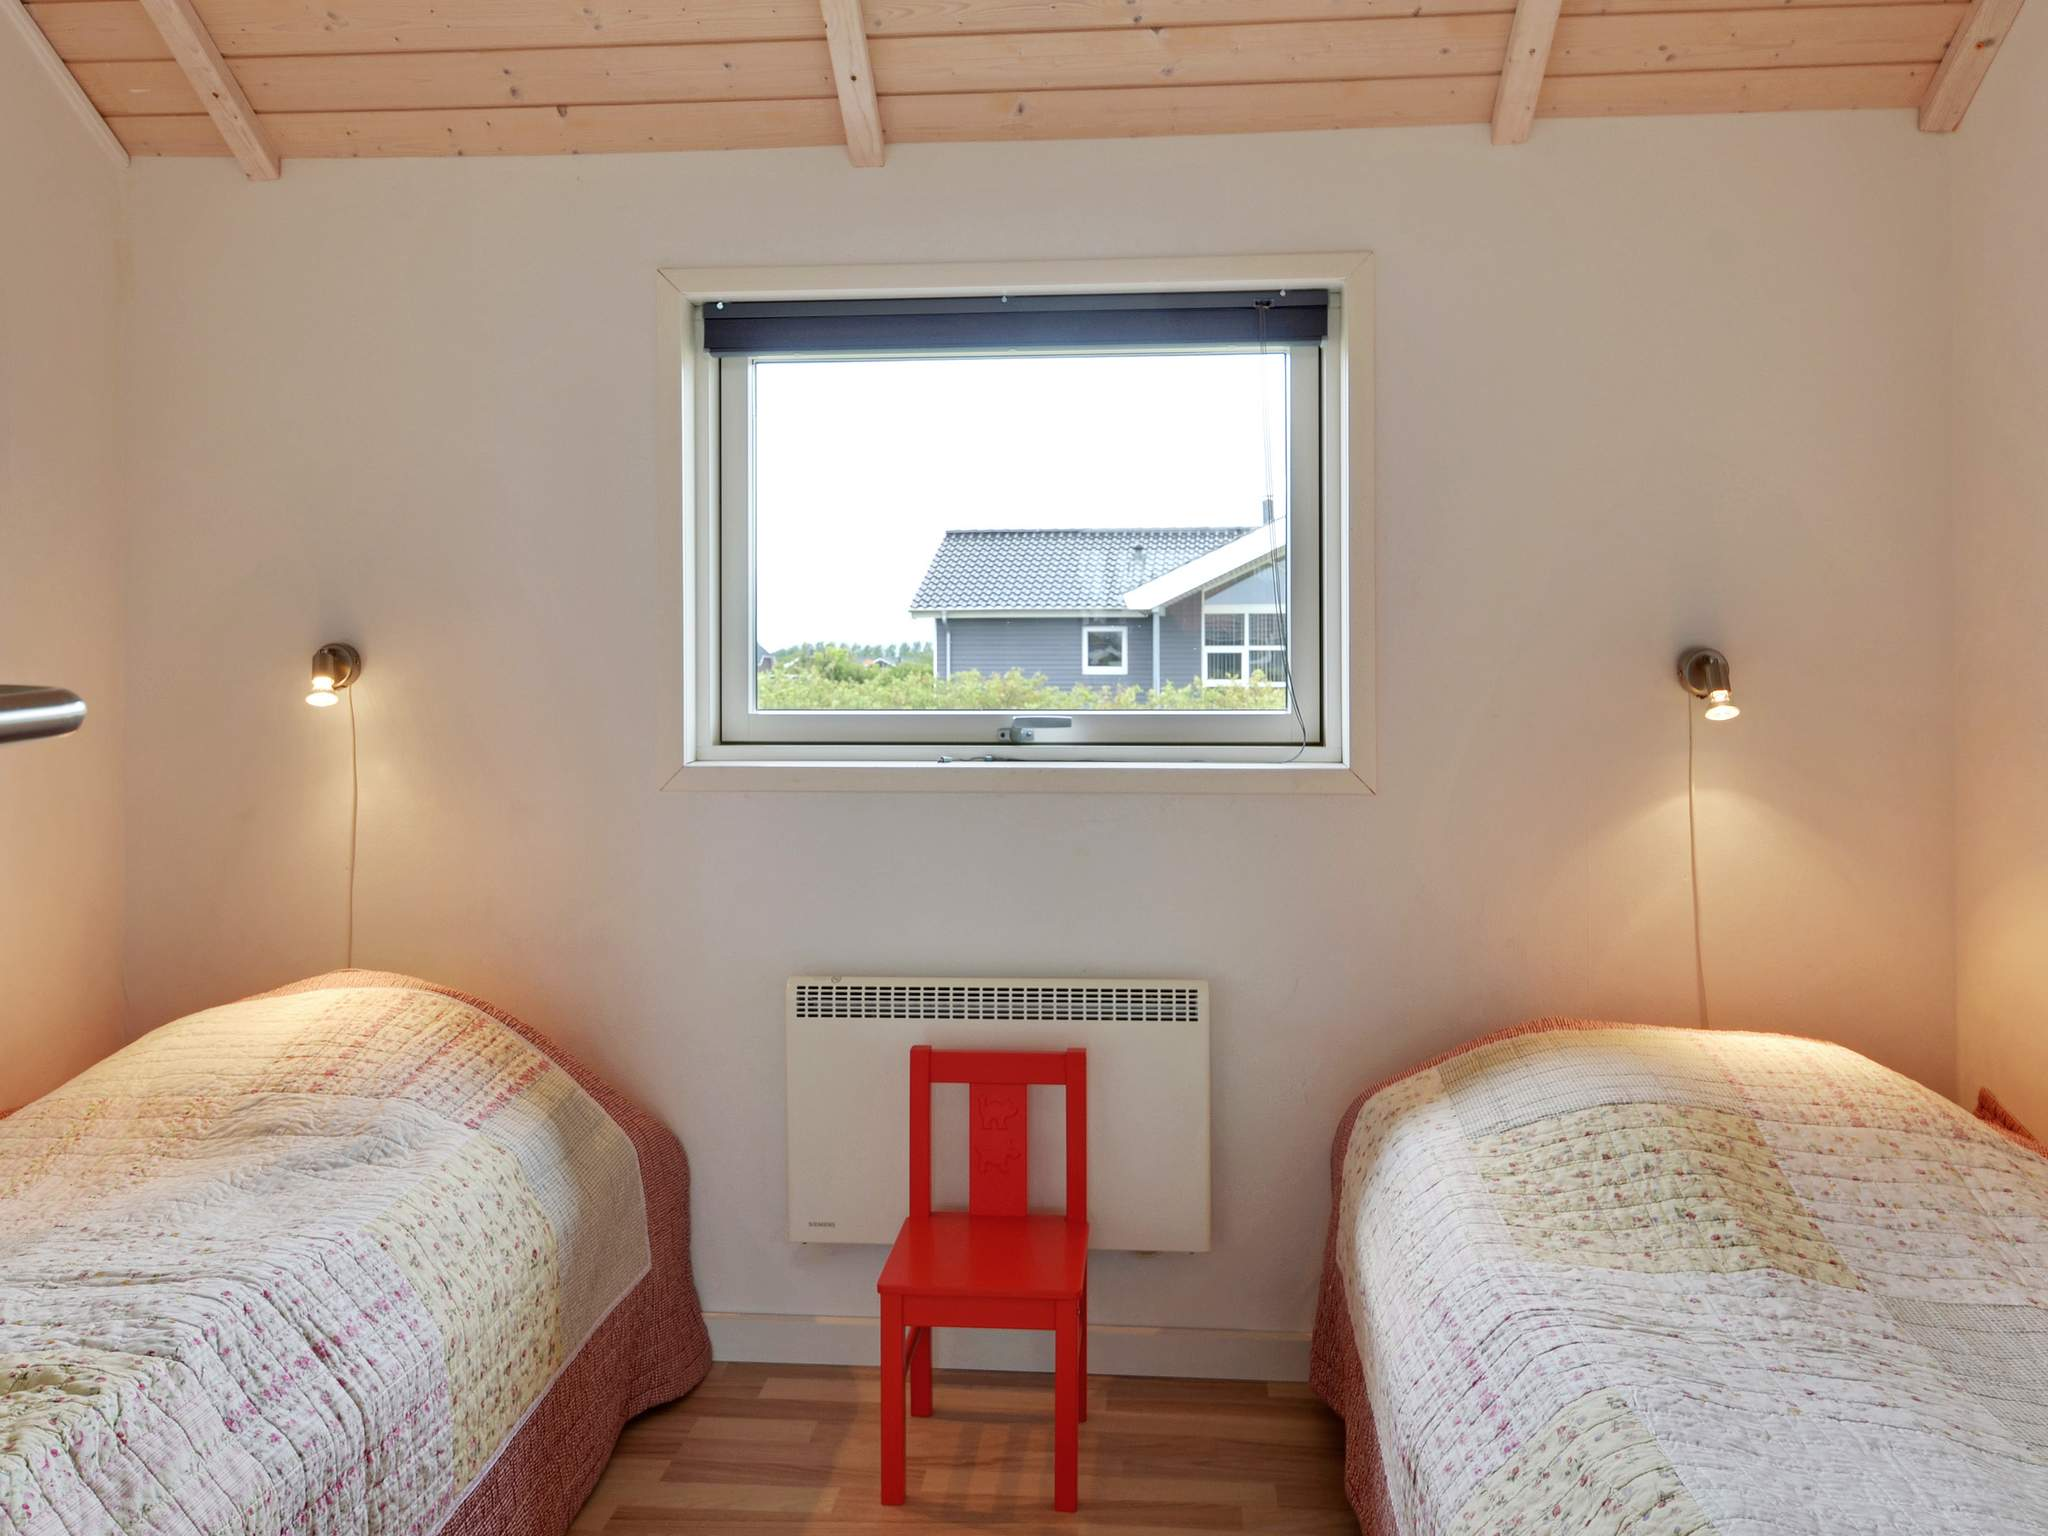 Ferienhaus Skaven Strand (160058), Tarm, , Westjütland, Dänemark, Bild 12